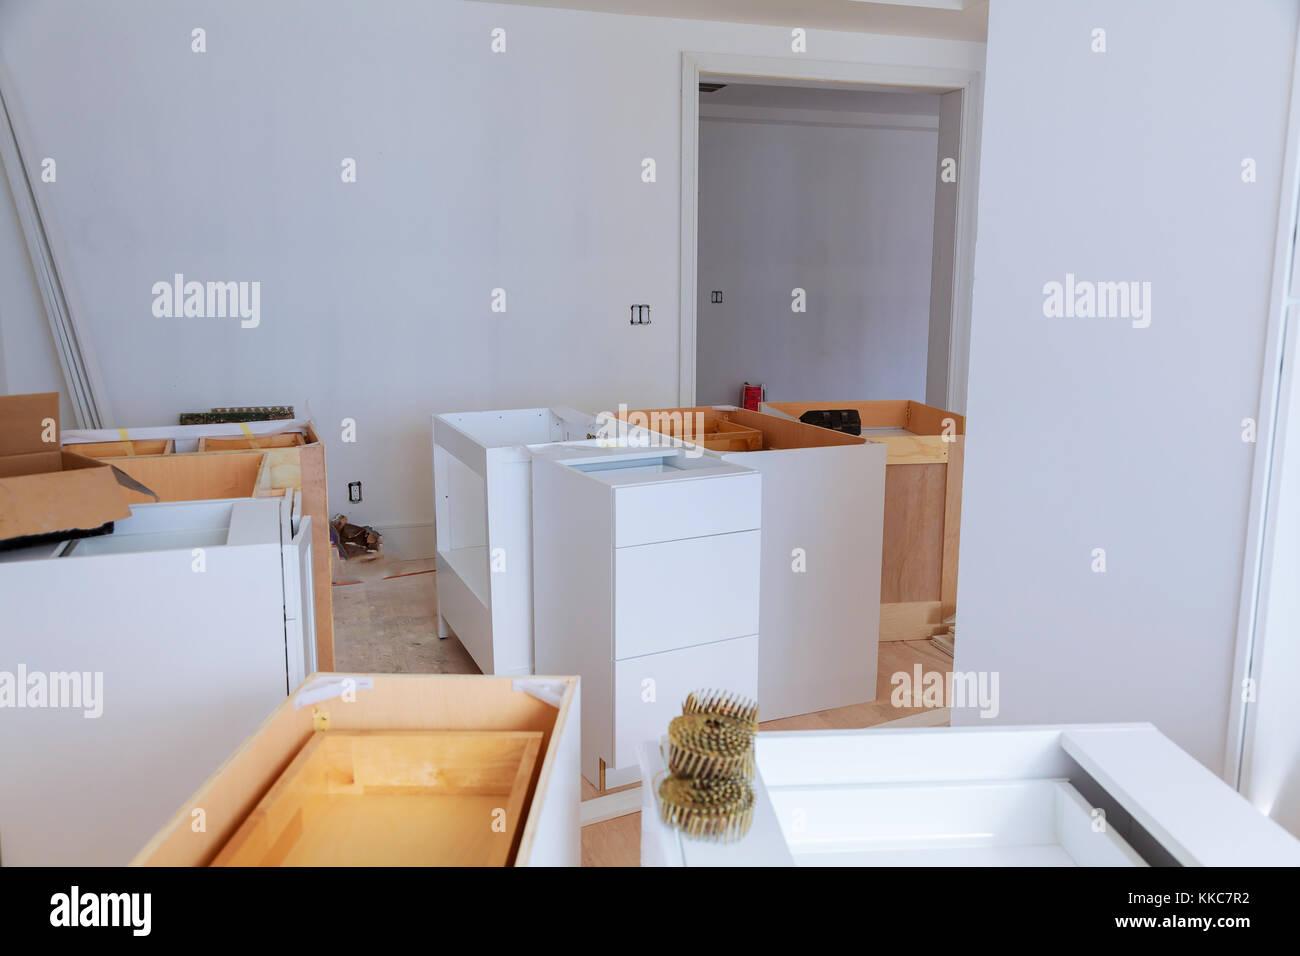 Extractor Fan Stockfotos & Extractor Fan Bilder - Seite 3 - Alamy